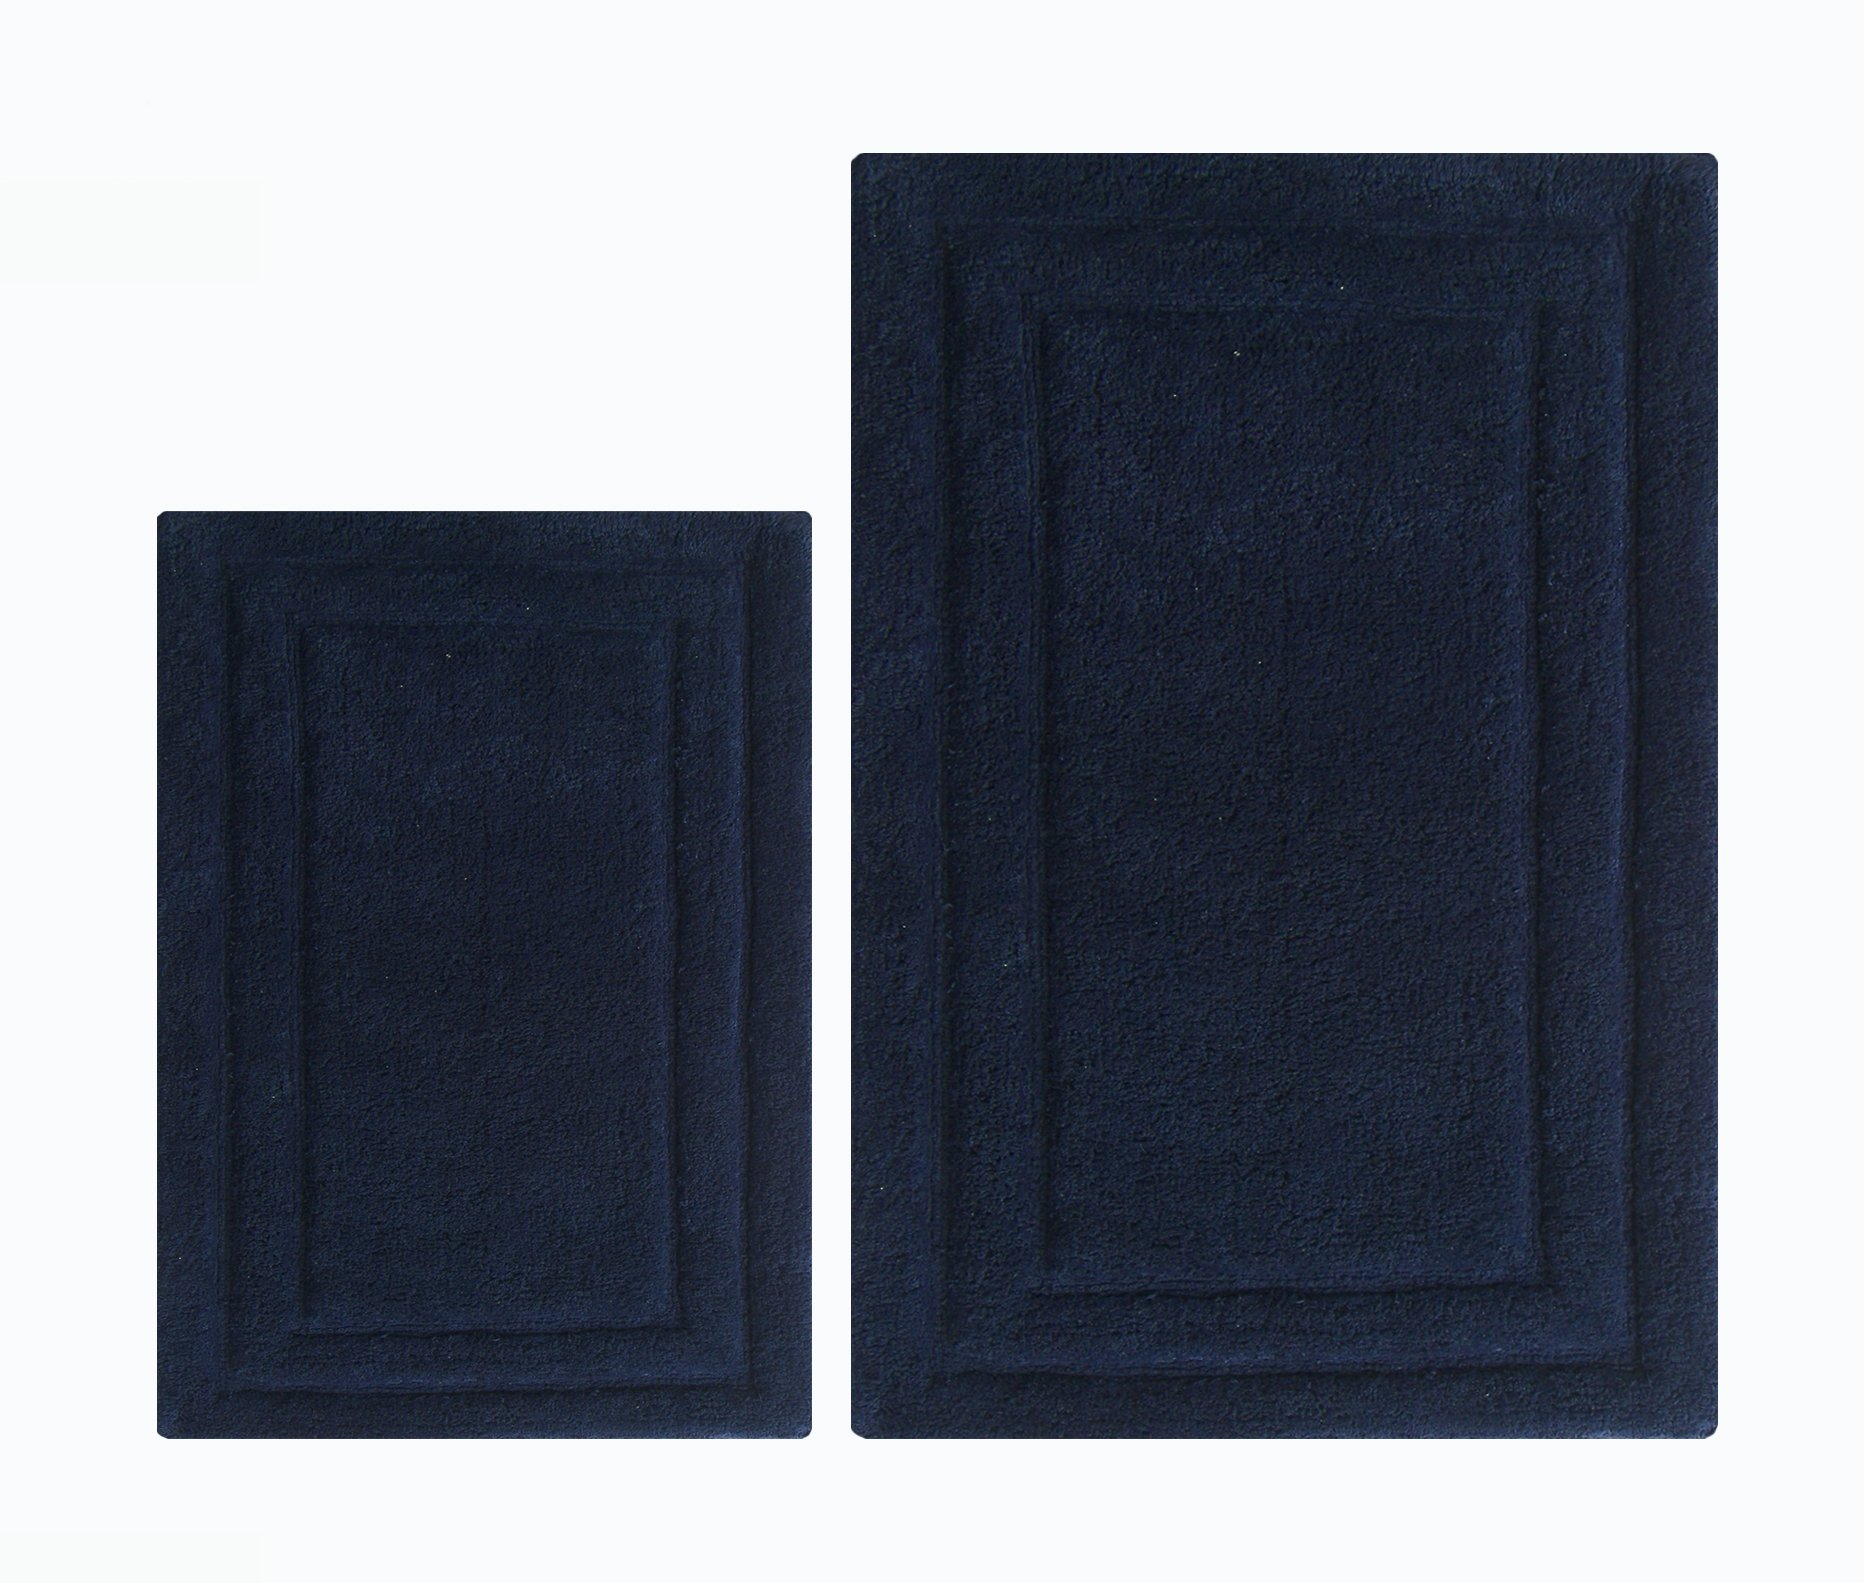 Chardin home 100% Cotton two Piece Classic Bath Rug Set, (24''x40'' & 21''x34'') with anti-skid spray latex back, Navy